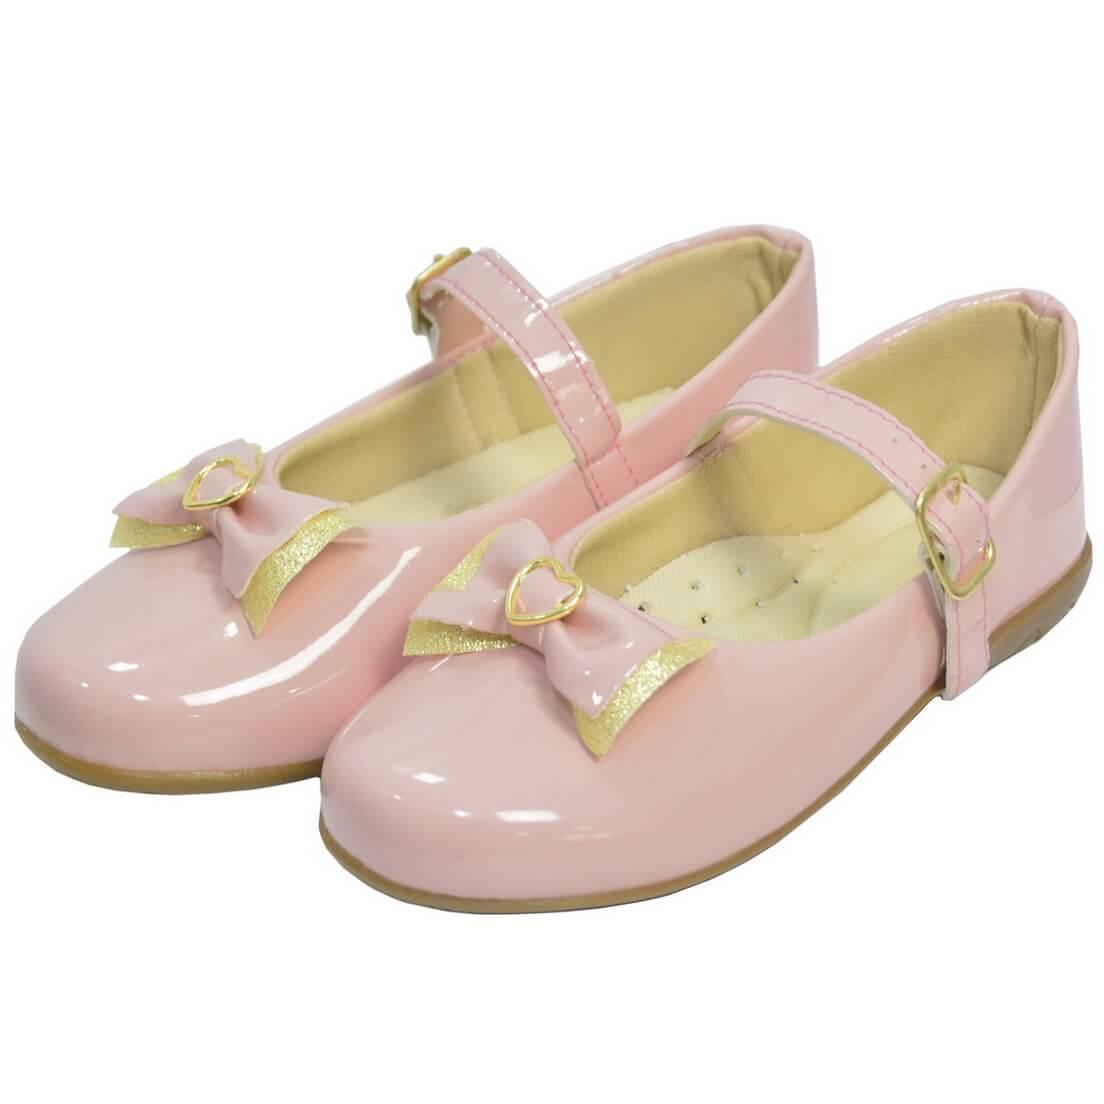 Sapatilha Infantil Rosa Laço no Bico - Sapato Menina